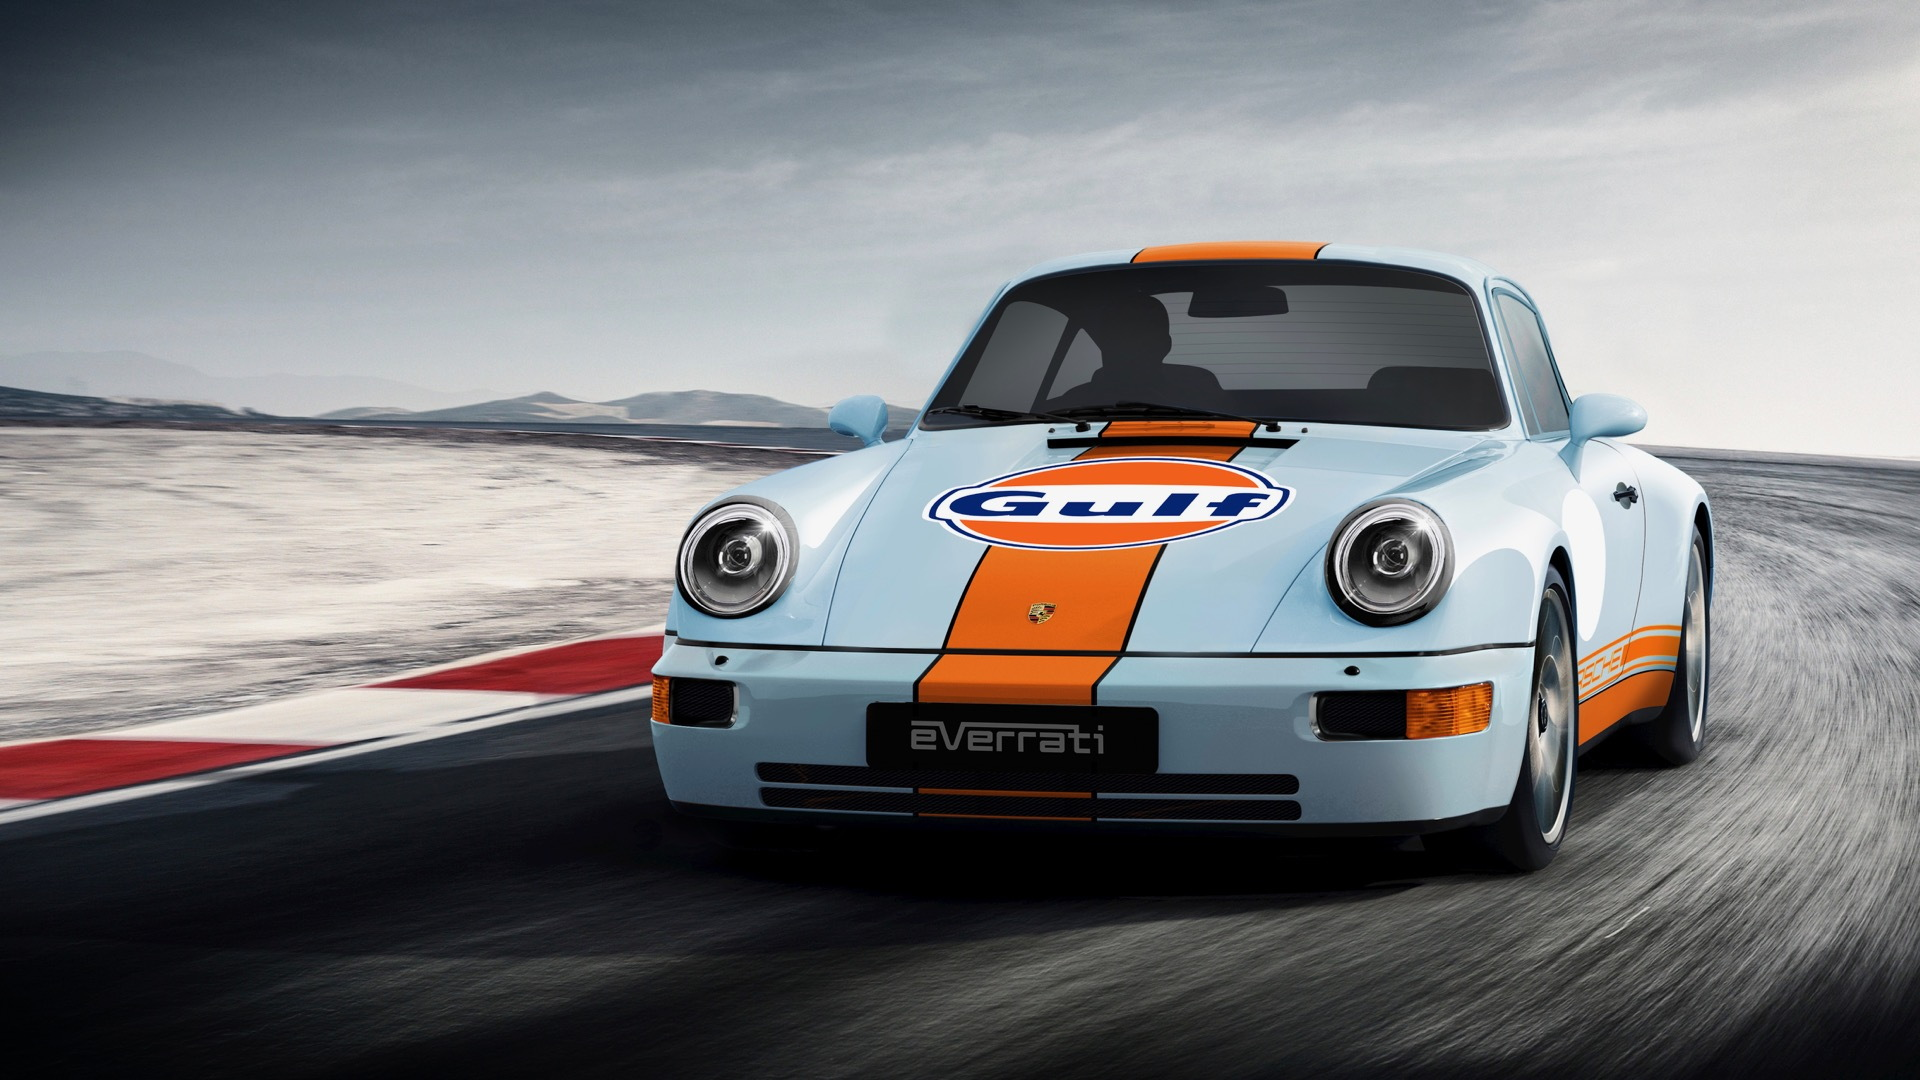 Everrati Gulf Signature Porsche 911 electric conversion